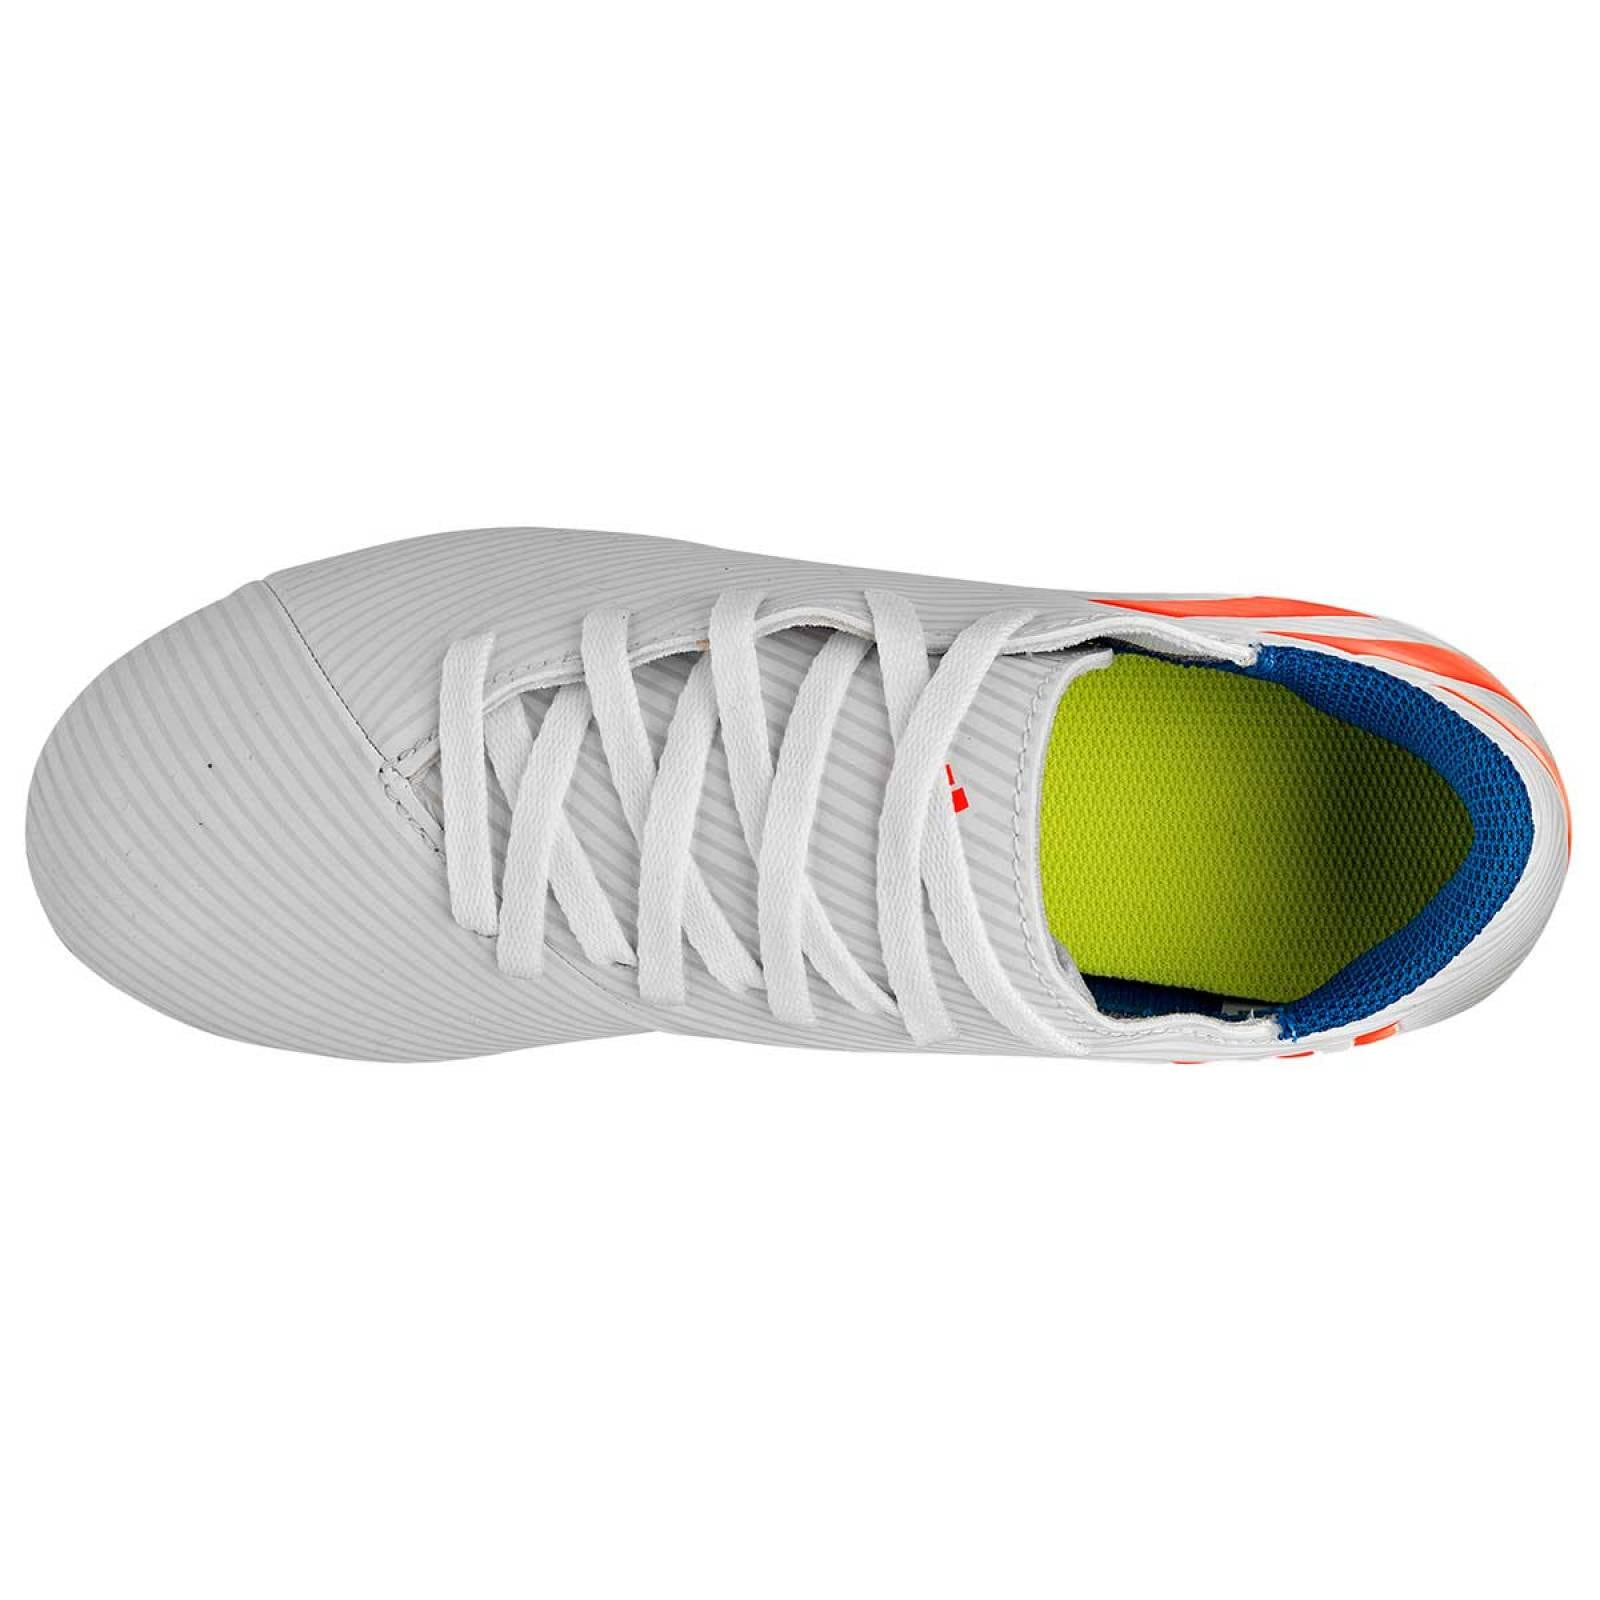 Adidas Tenis Joven Blanco naranja